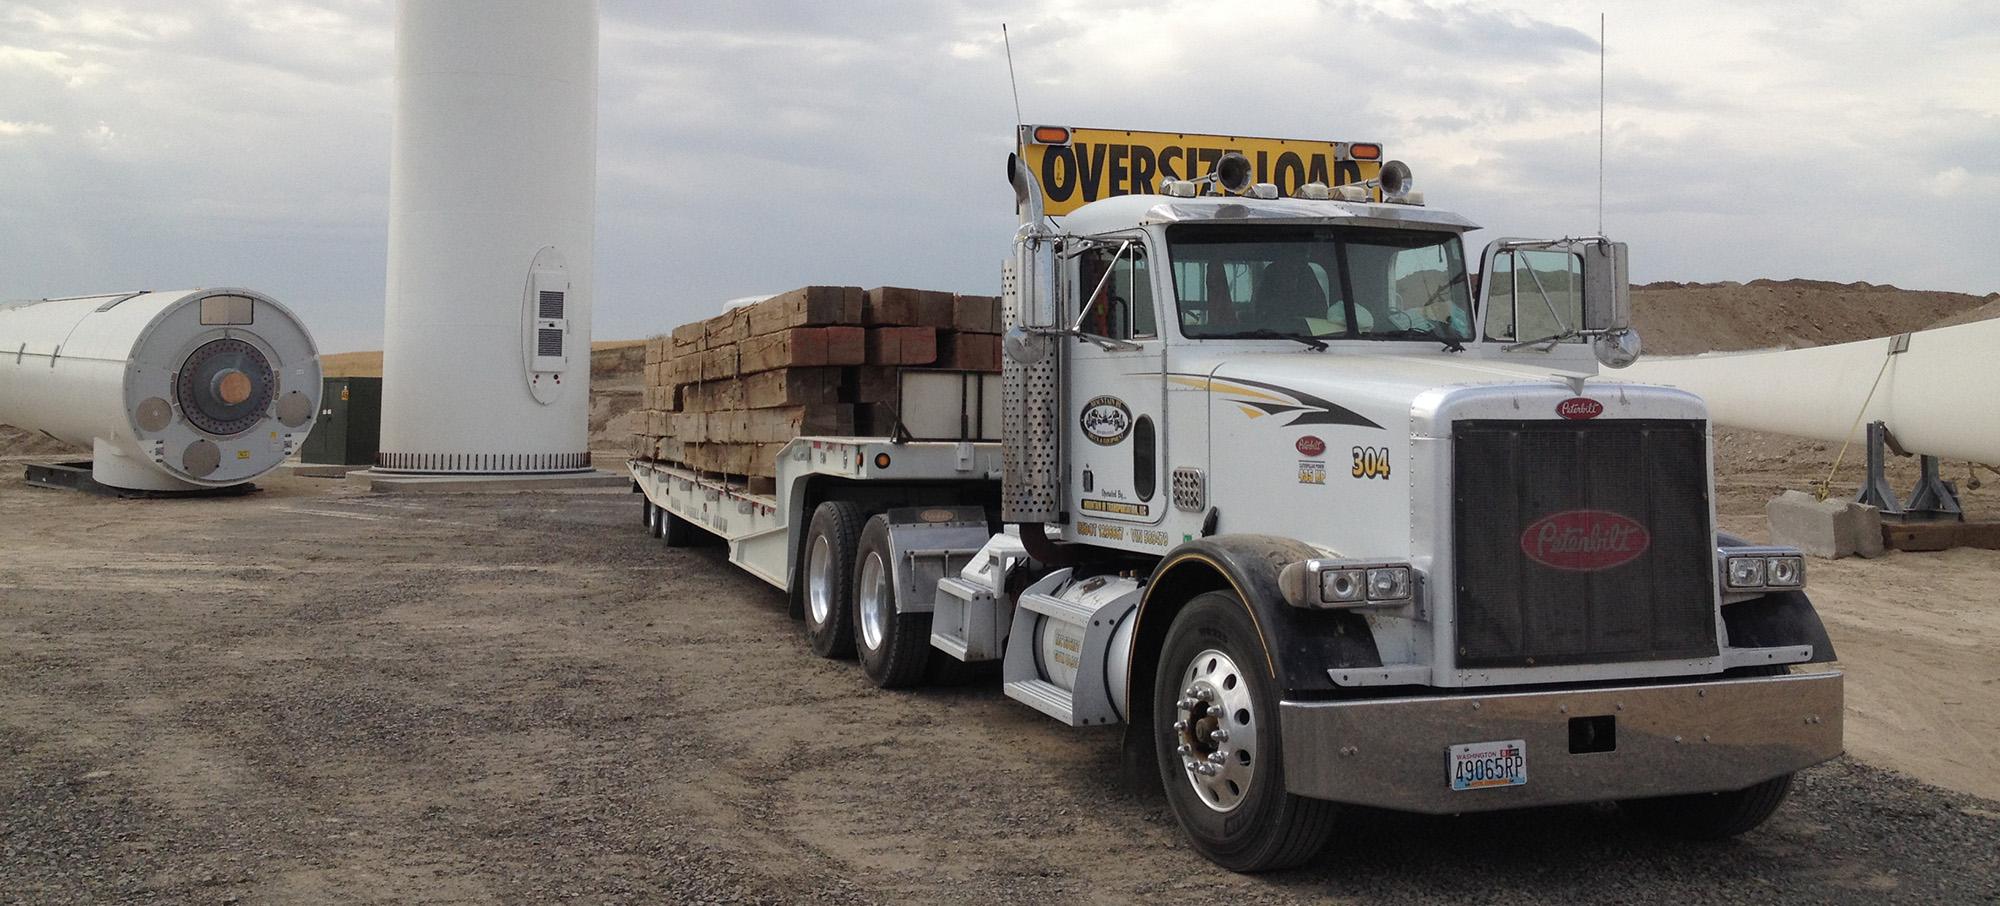 Mountain Hi Truck & Equipment